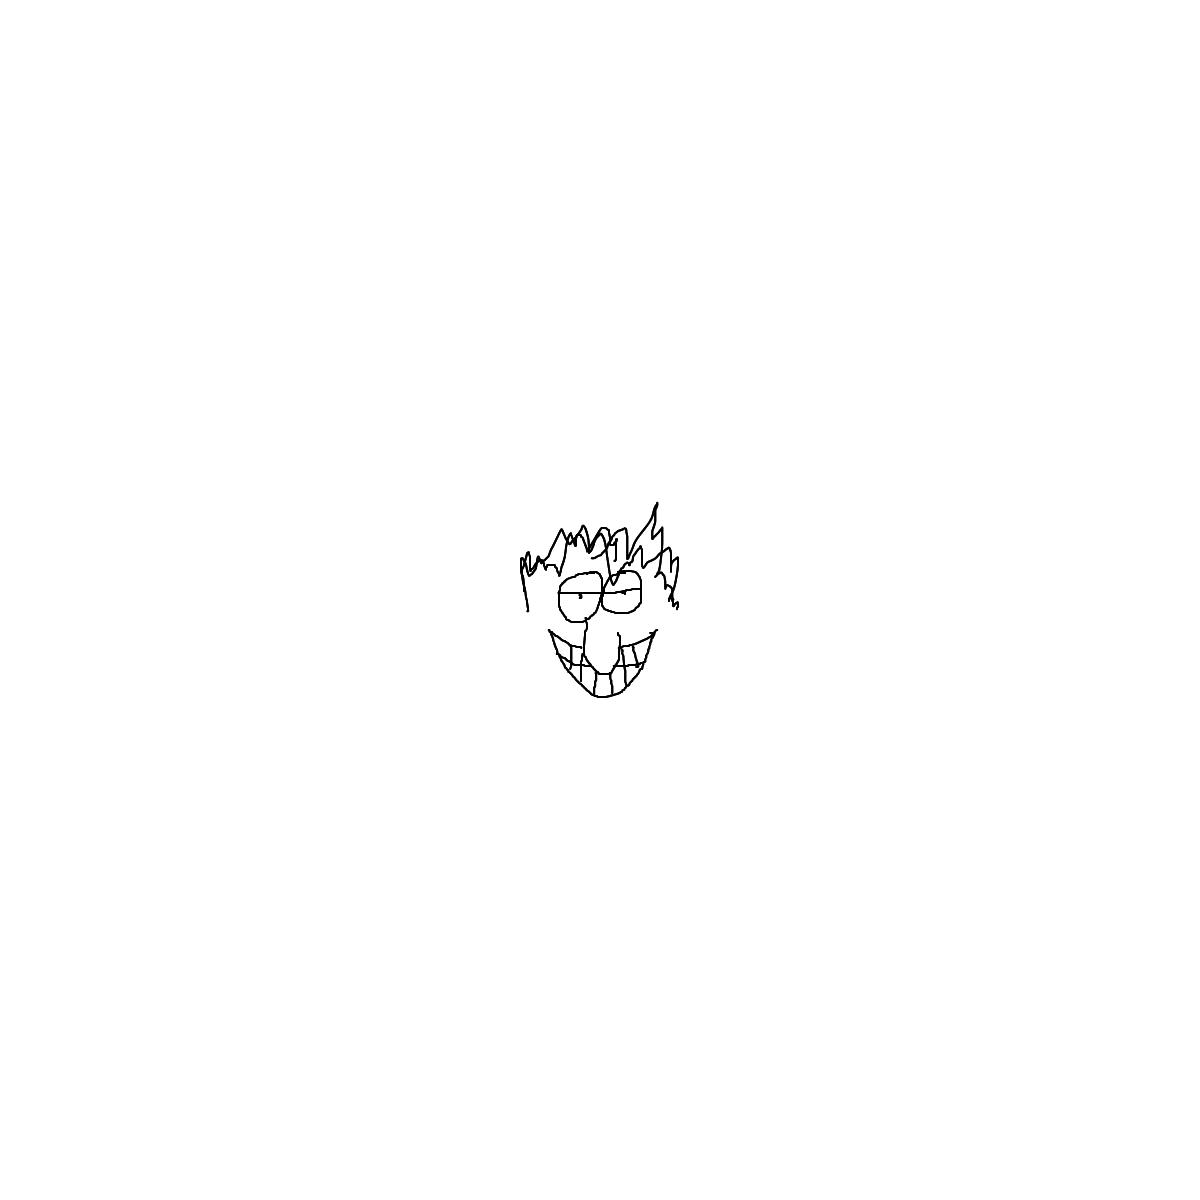 BAAAM drawing#2737 lat:53.5222167968750000lng: -113.5116500854492200